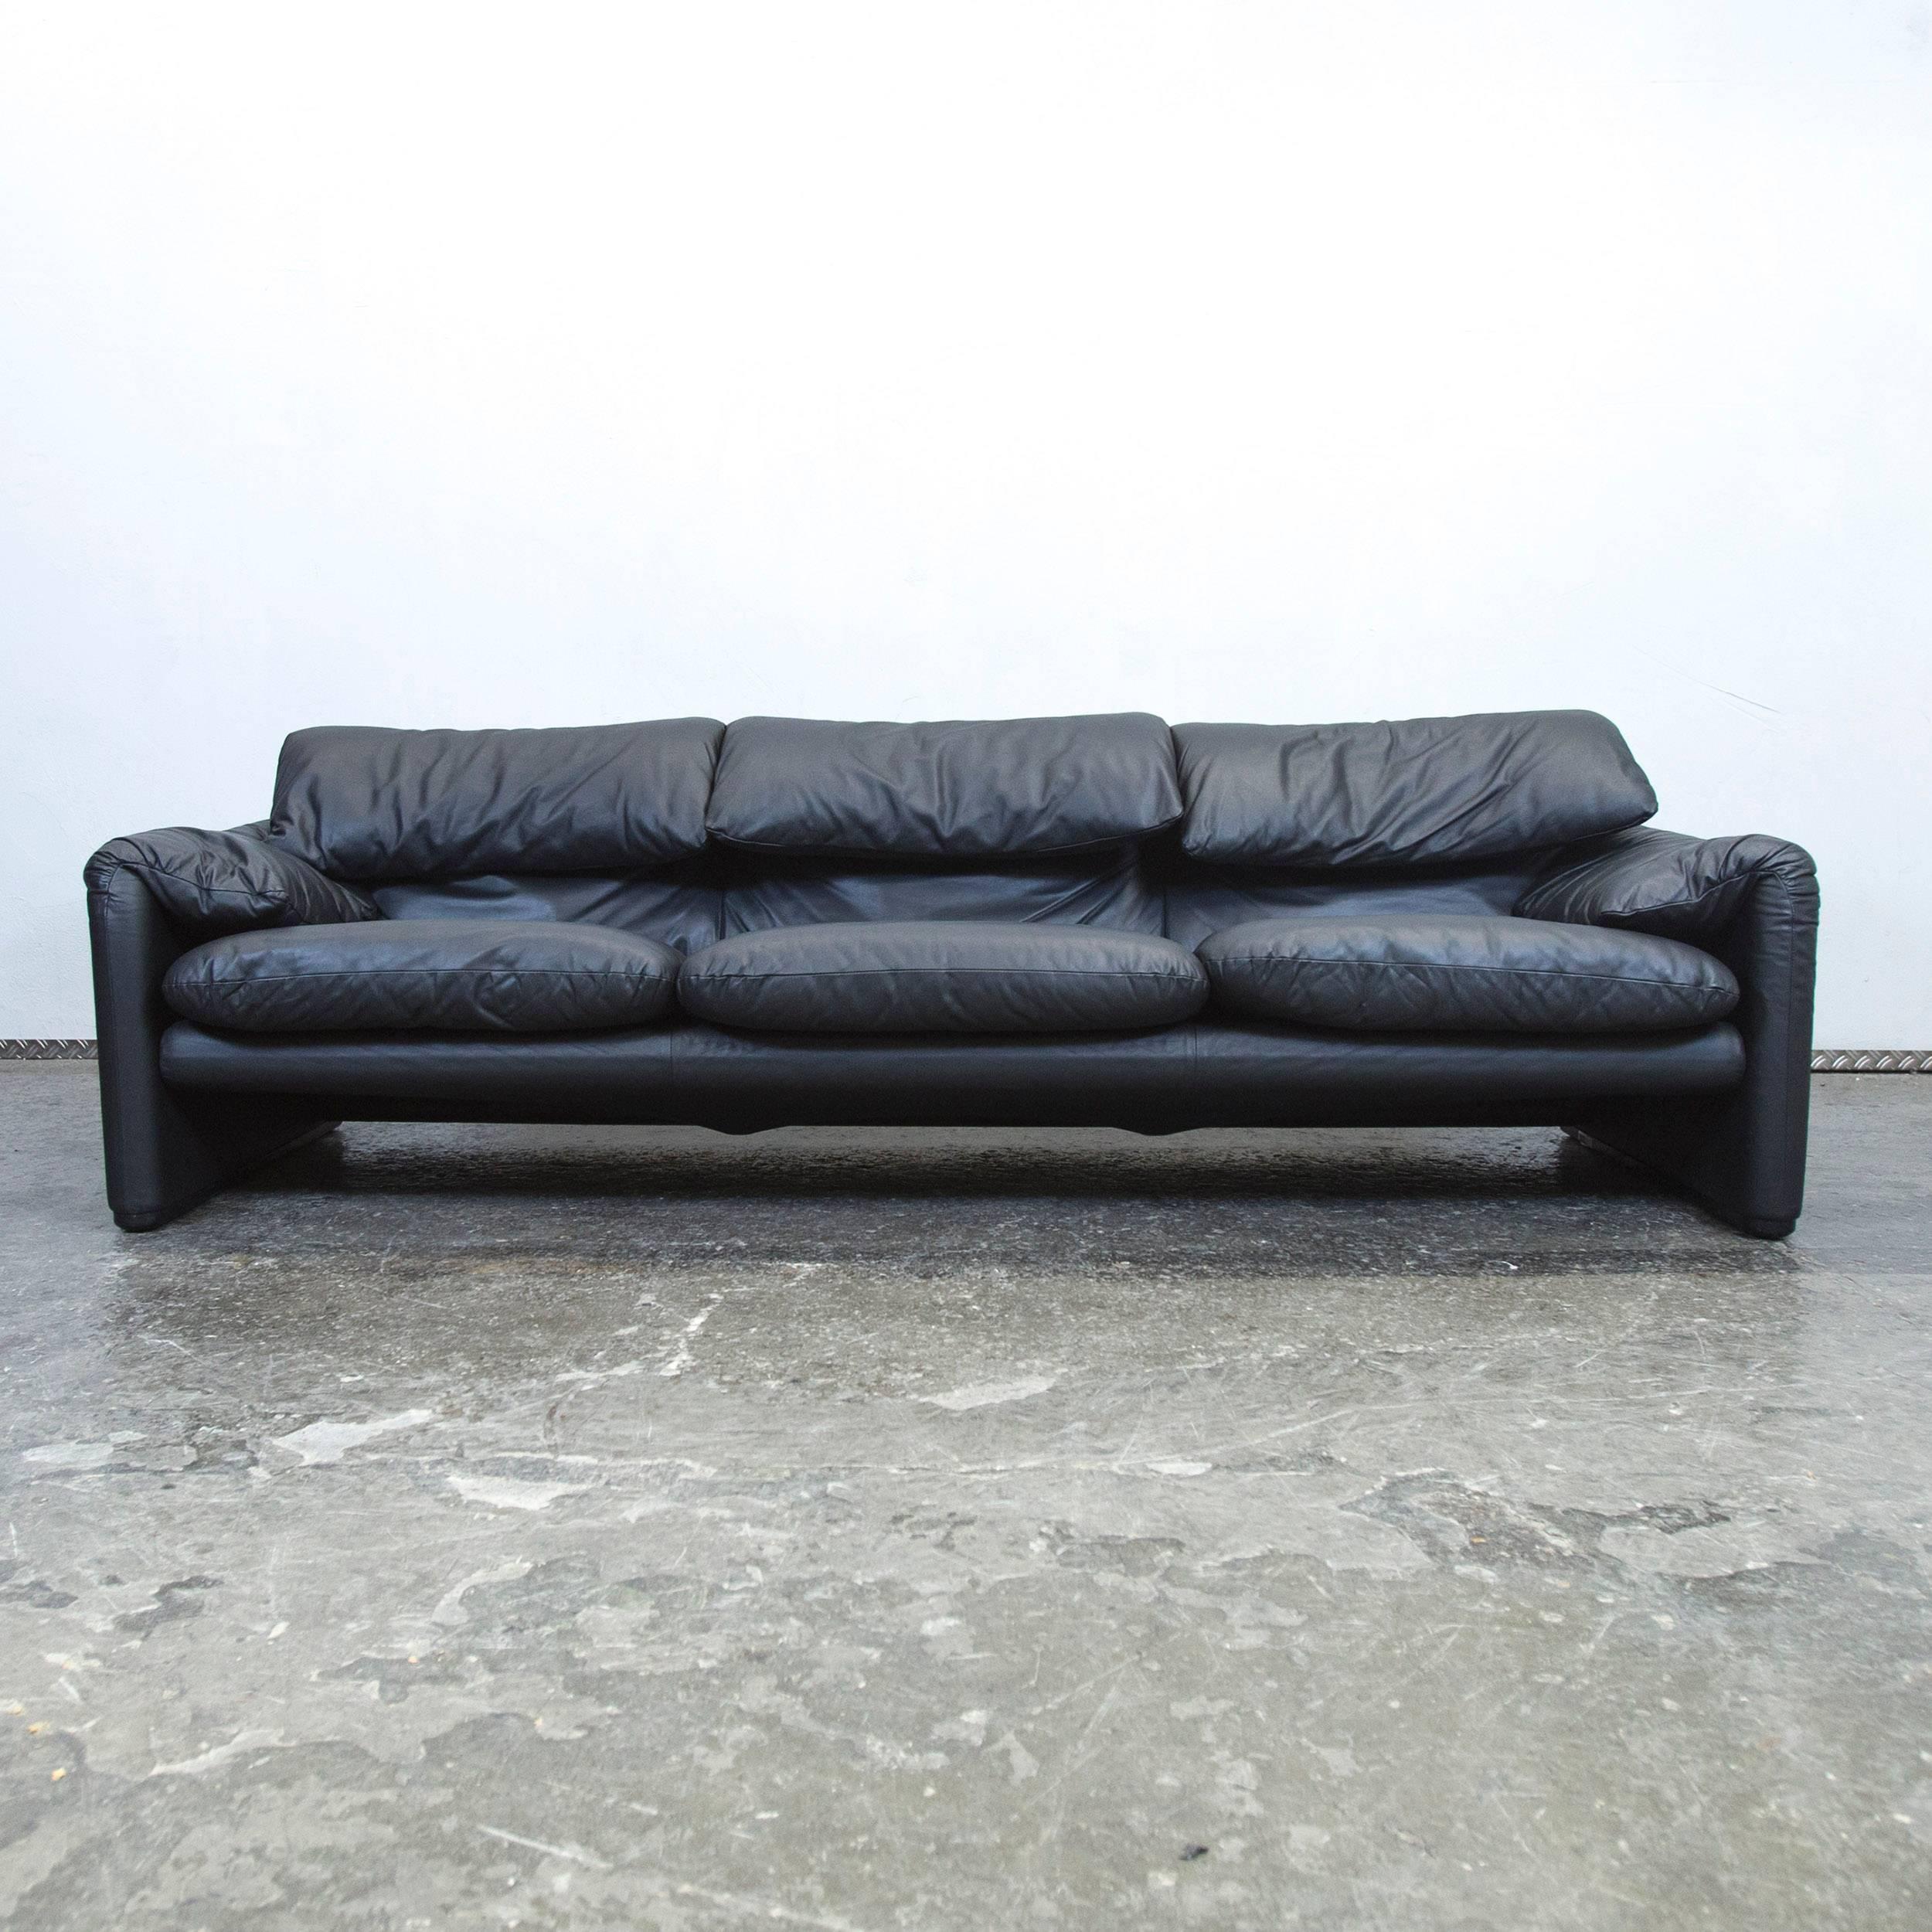 Top Ergebnis 50 Neu Designer Couch Leder Grafiken 2018 Kdj5 2017